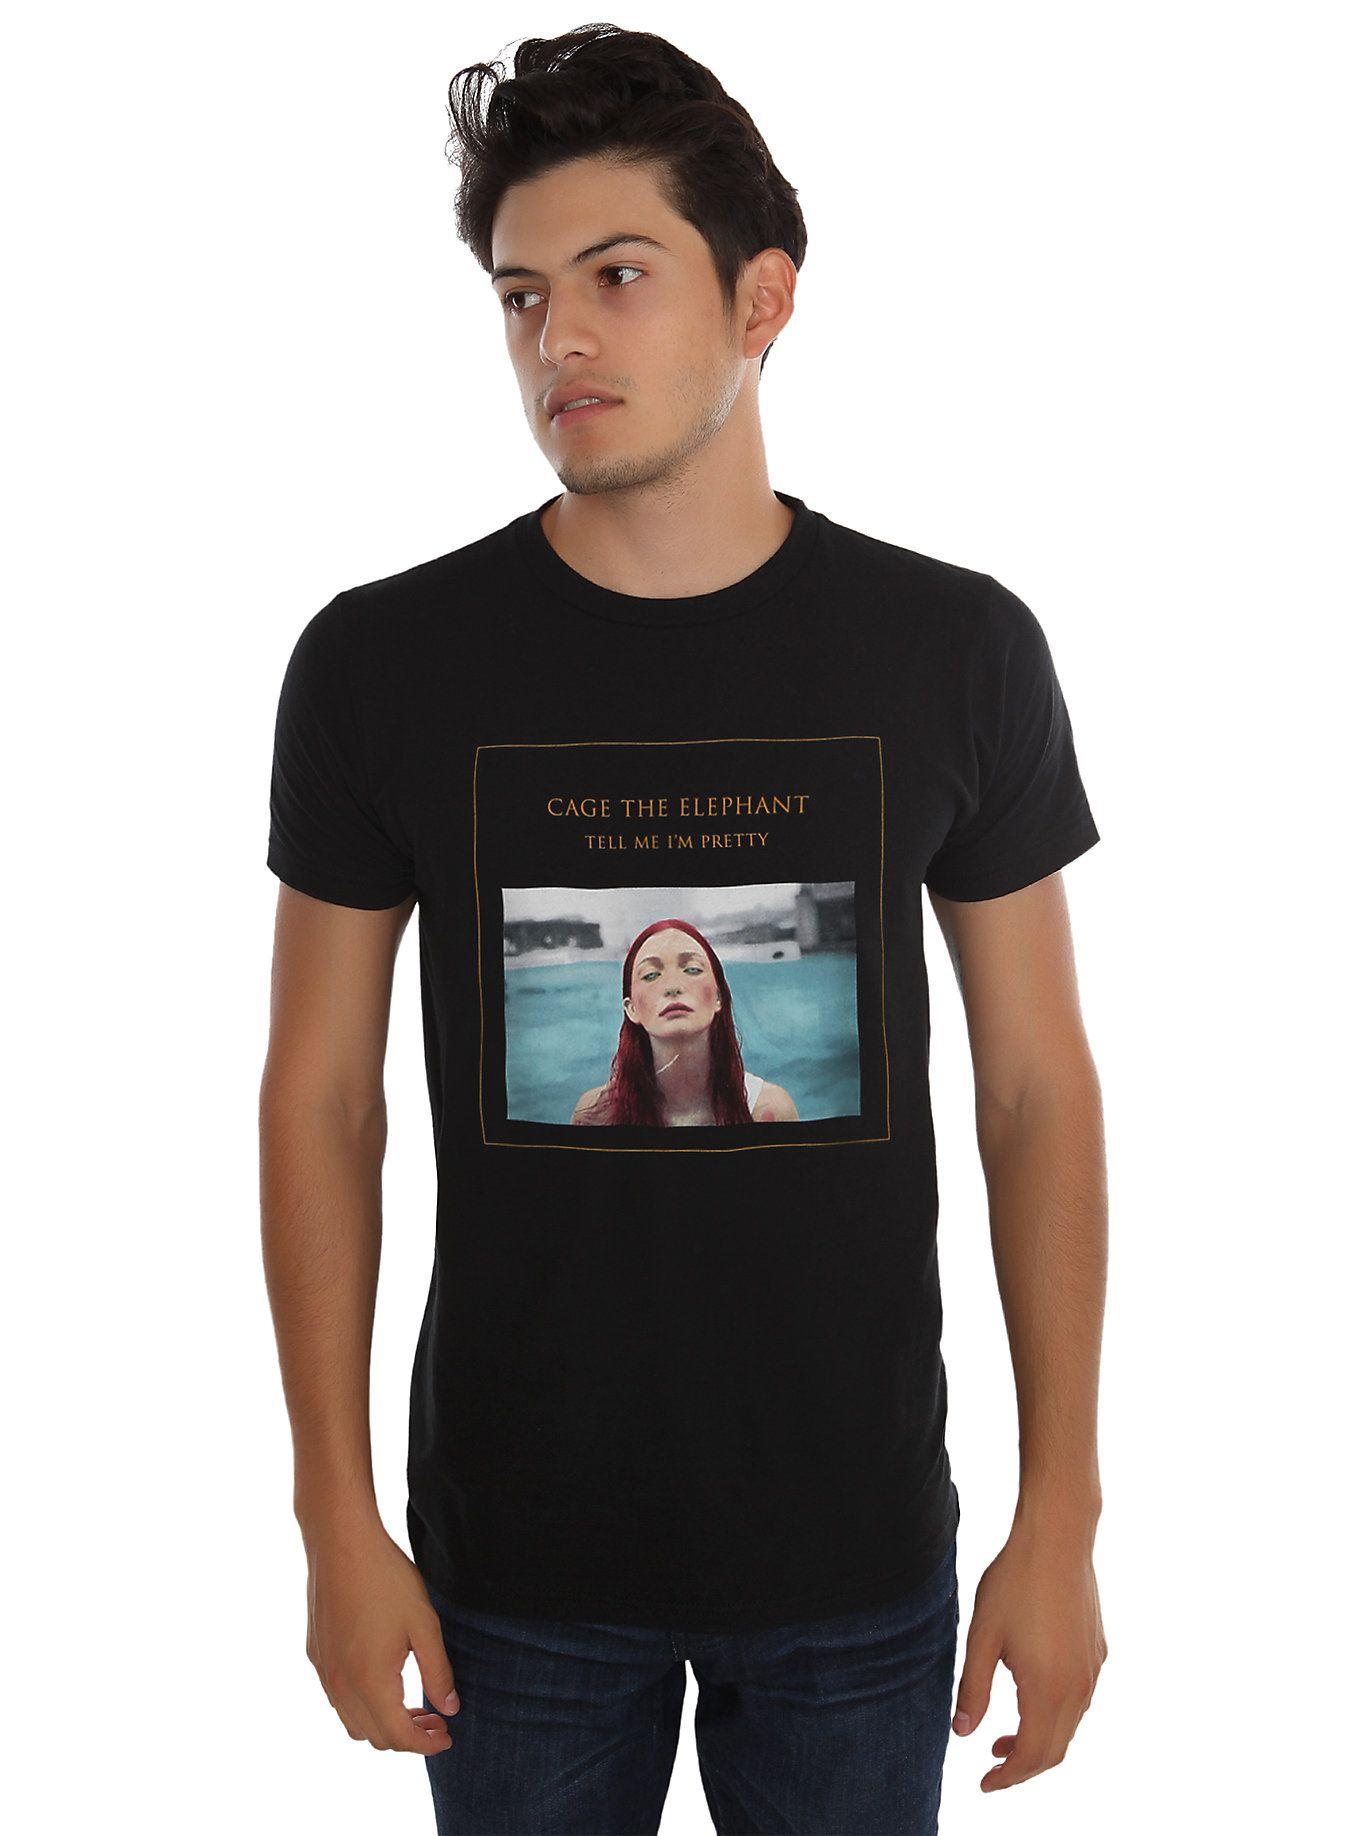 Im black t shirt - Cage The Elephant Tell Me I M Pretty T Shirt Hot Topic